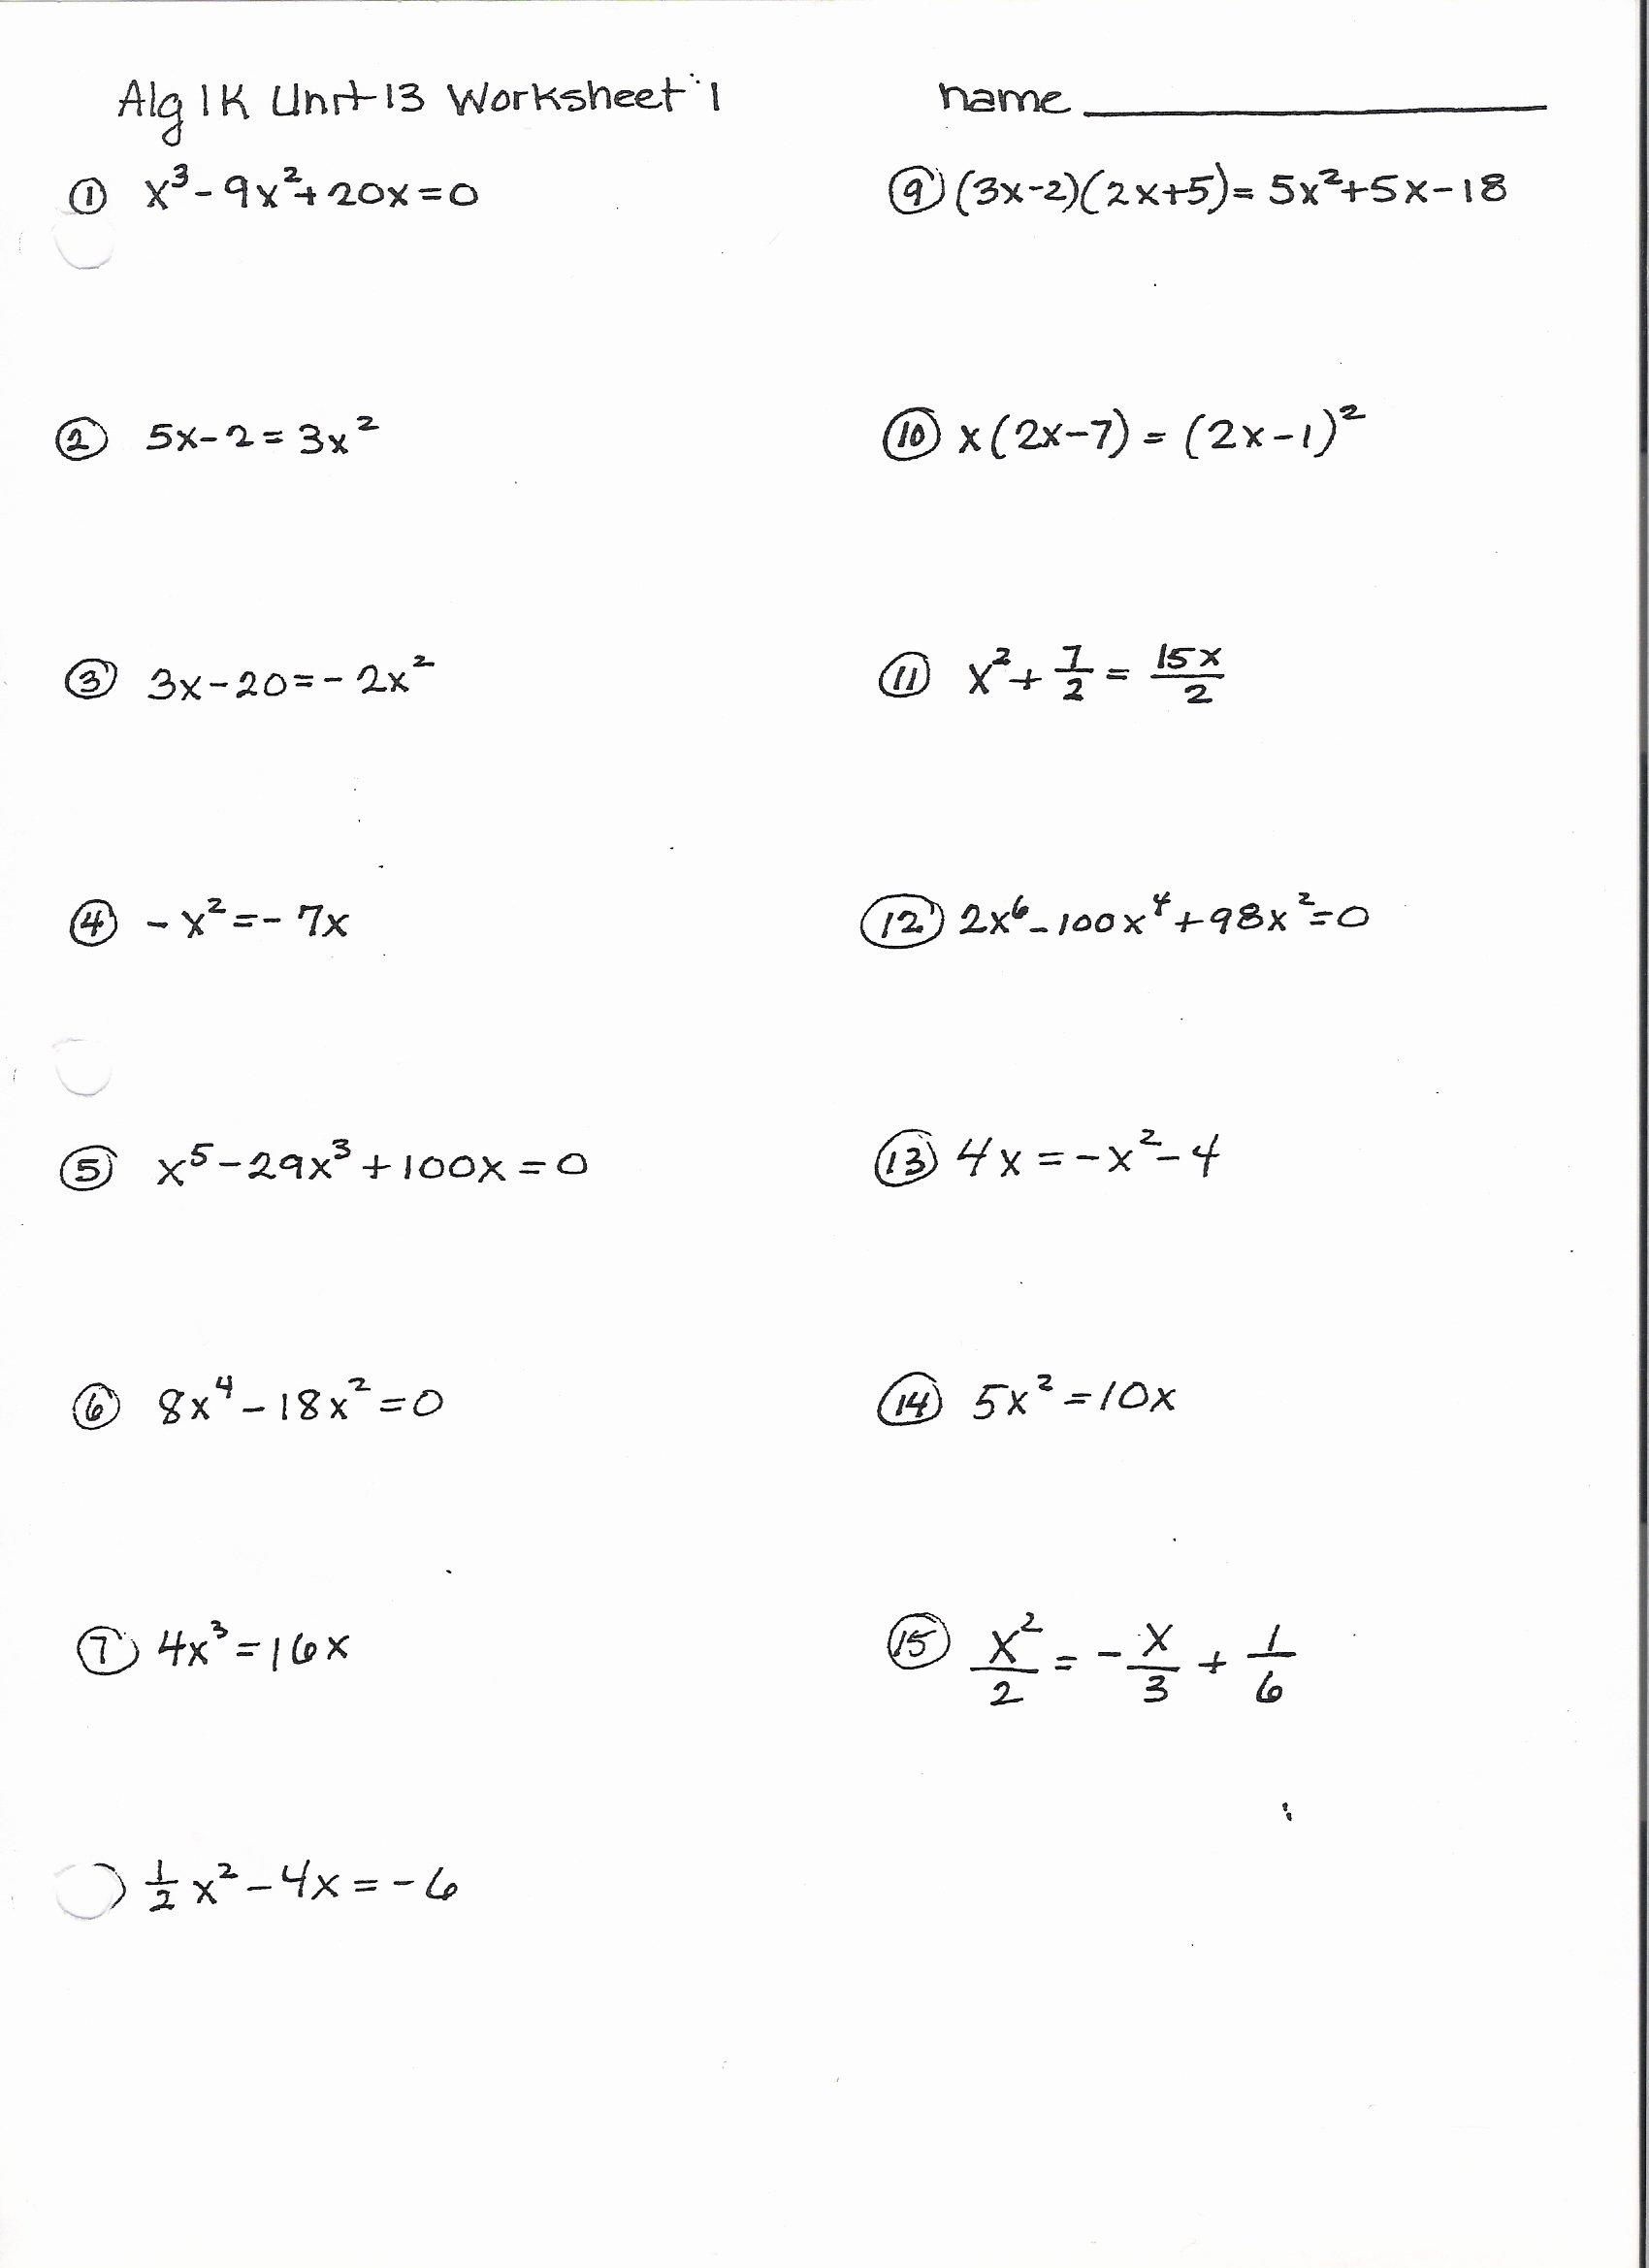 Factoring Worksheet Algebra 1 Awesome 11 Best Of Factoring Worksheets Algebra Ii